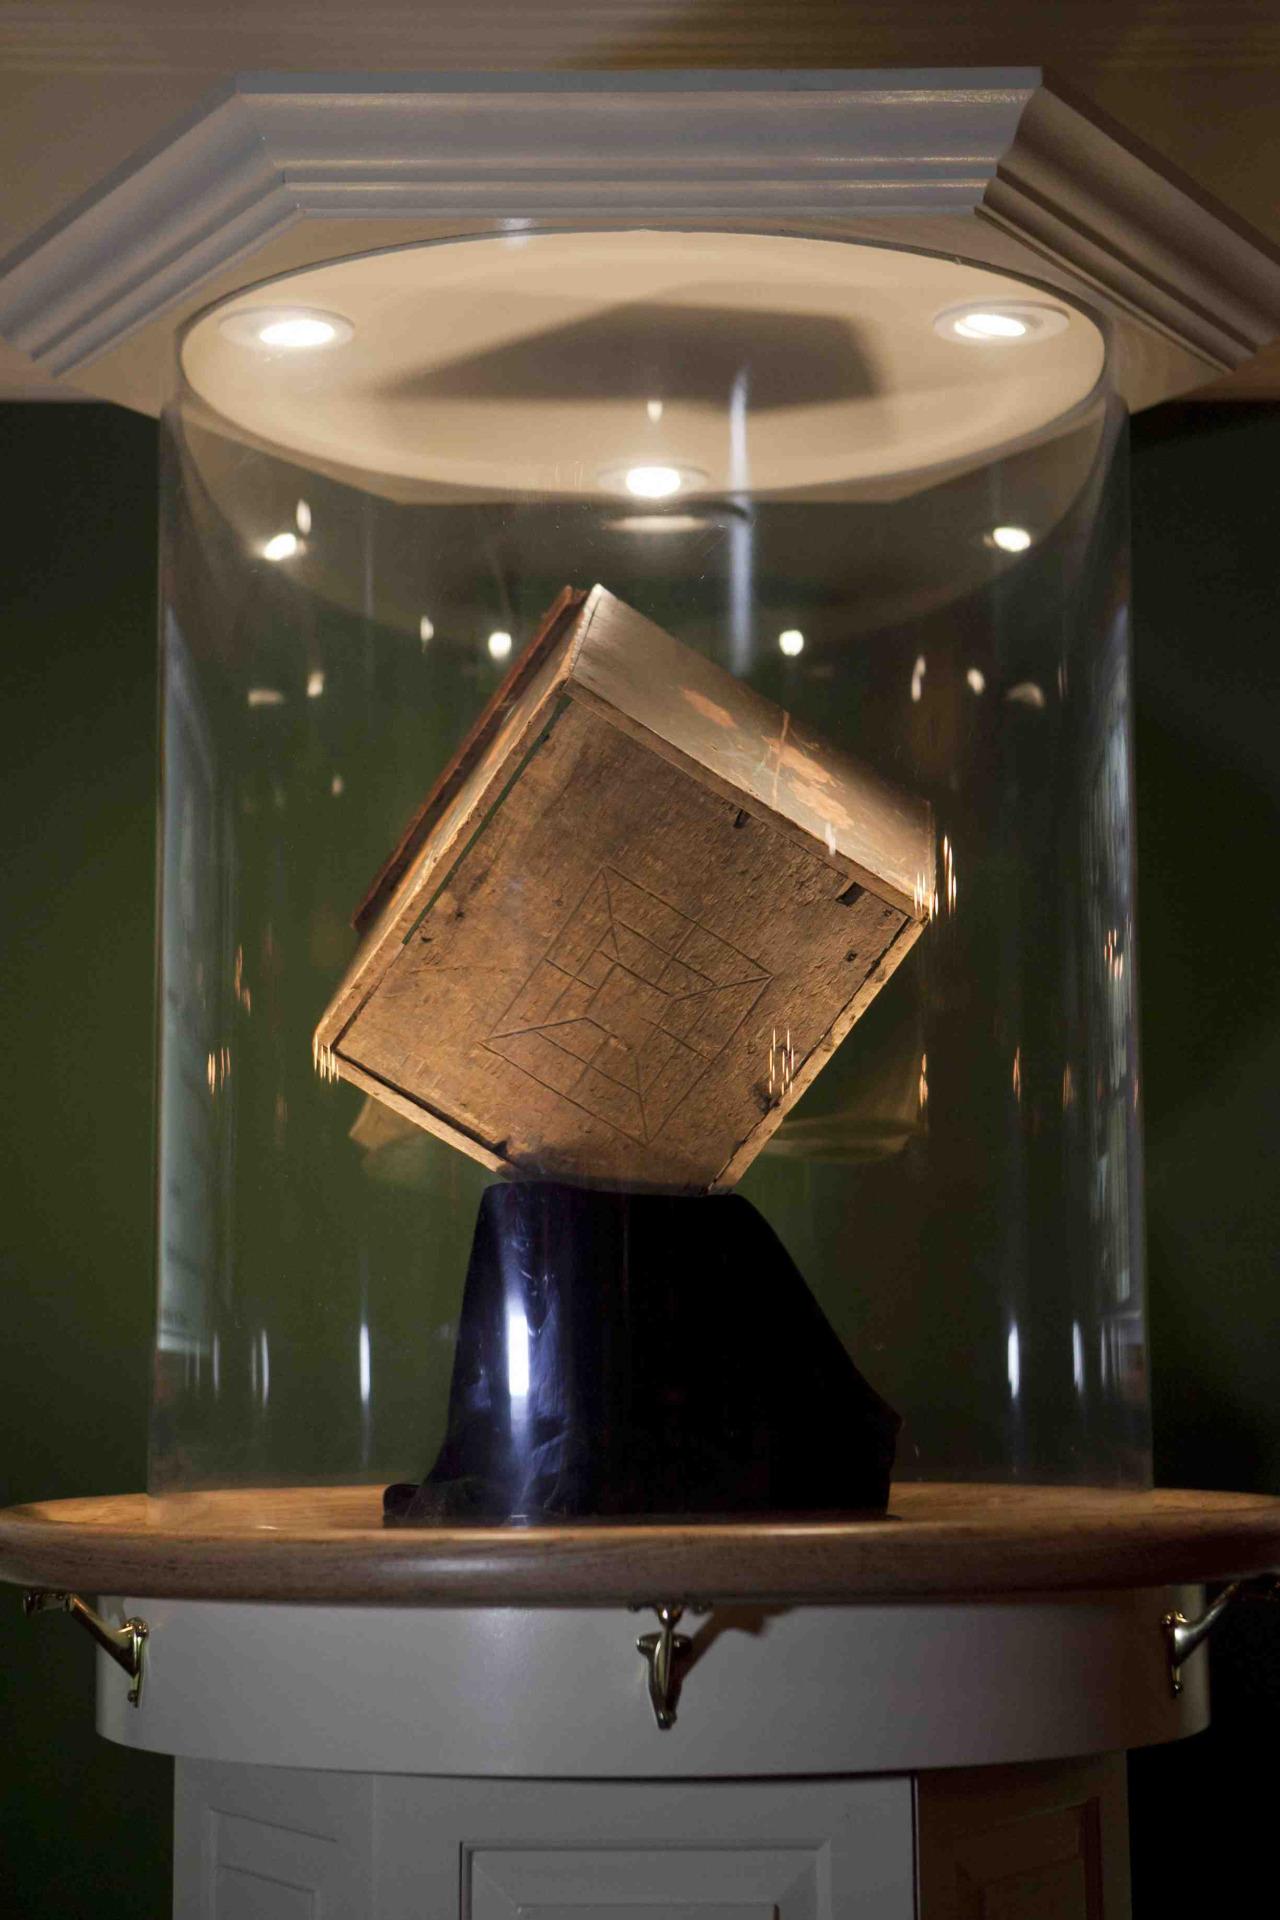 Tea Box from the Boston Tea Party